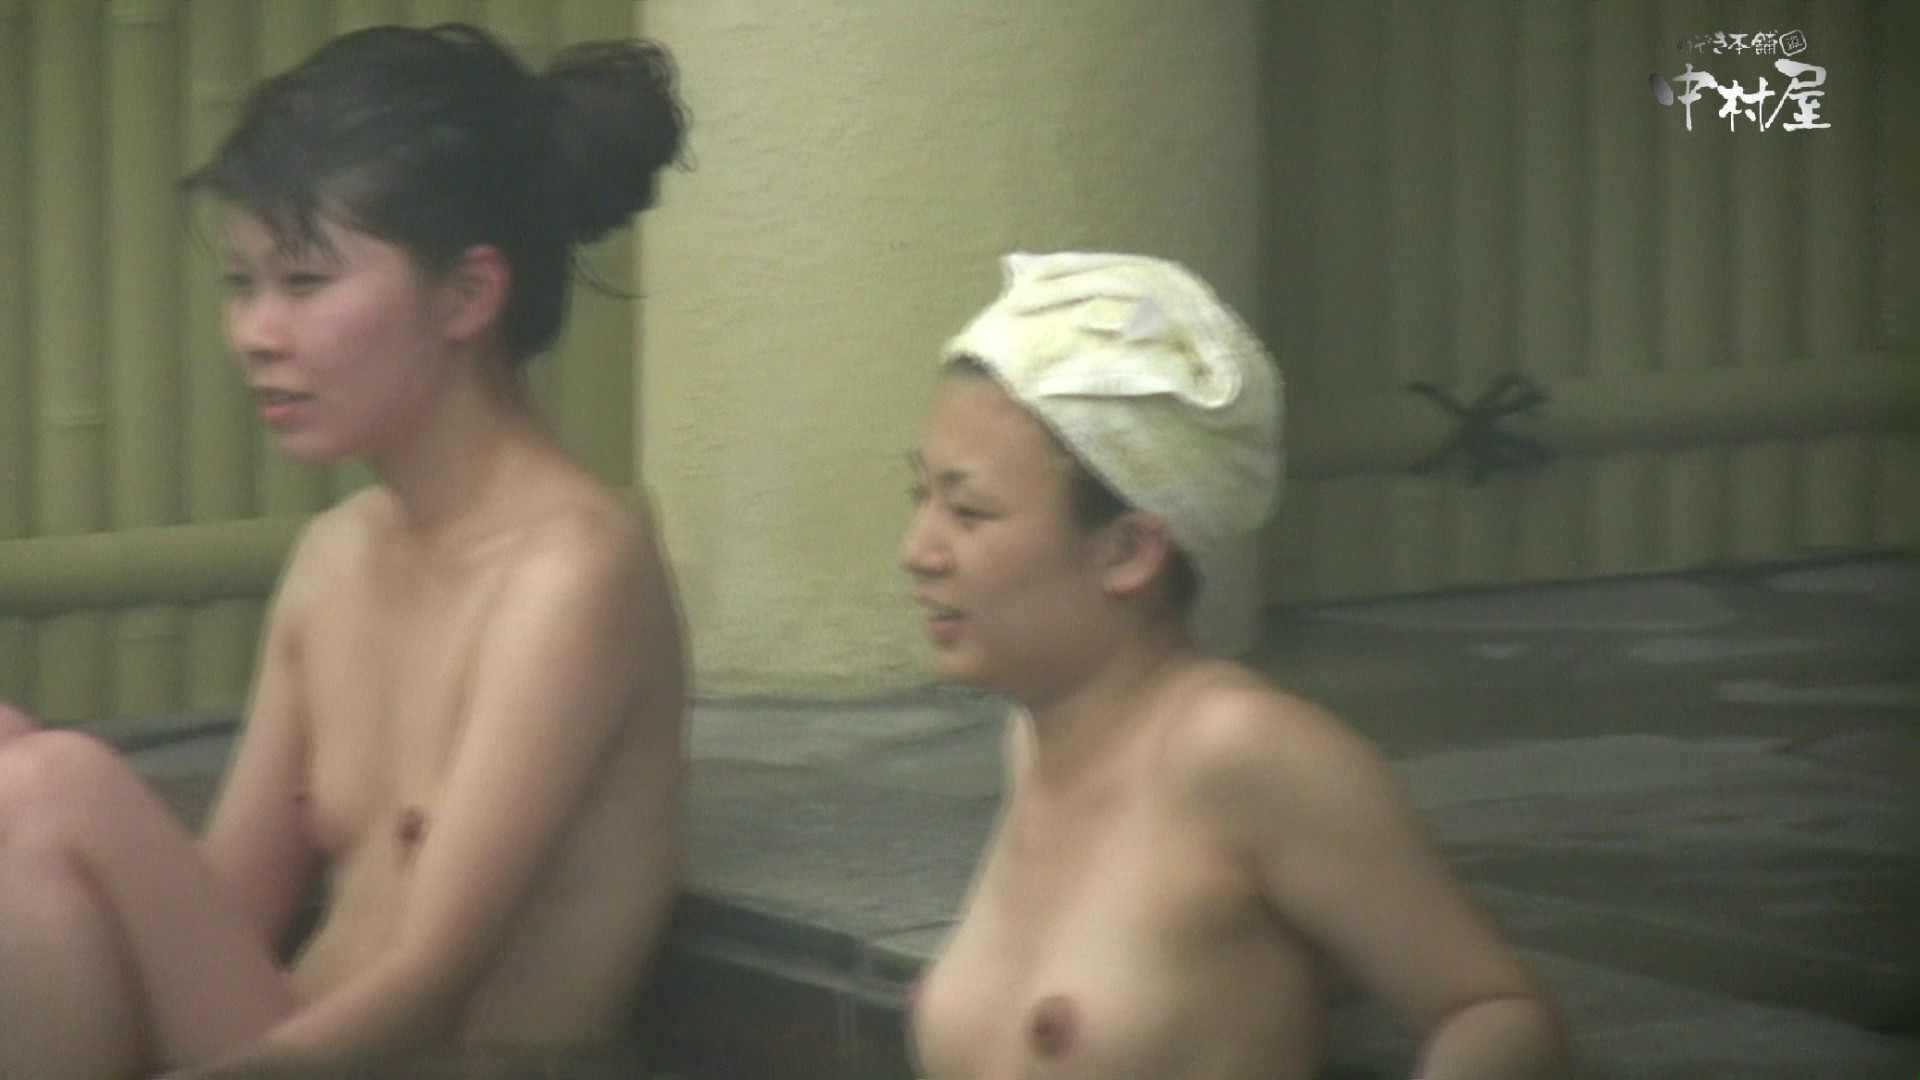 Aquaな露天風呂Vol.890 0  85連発 58